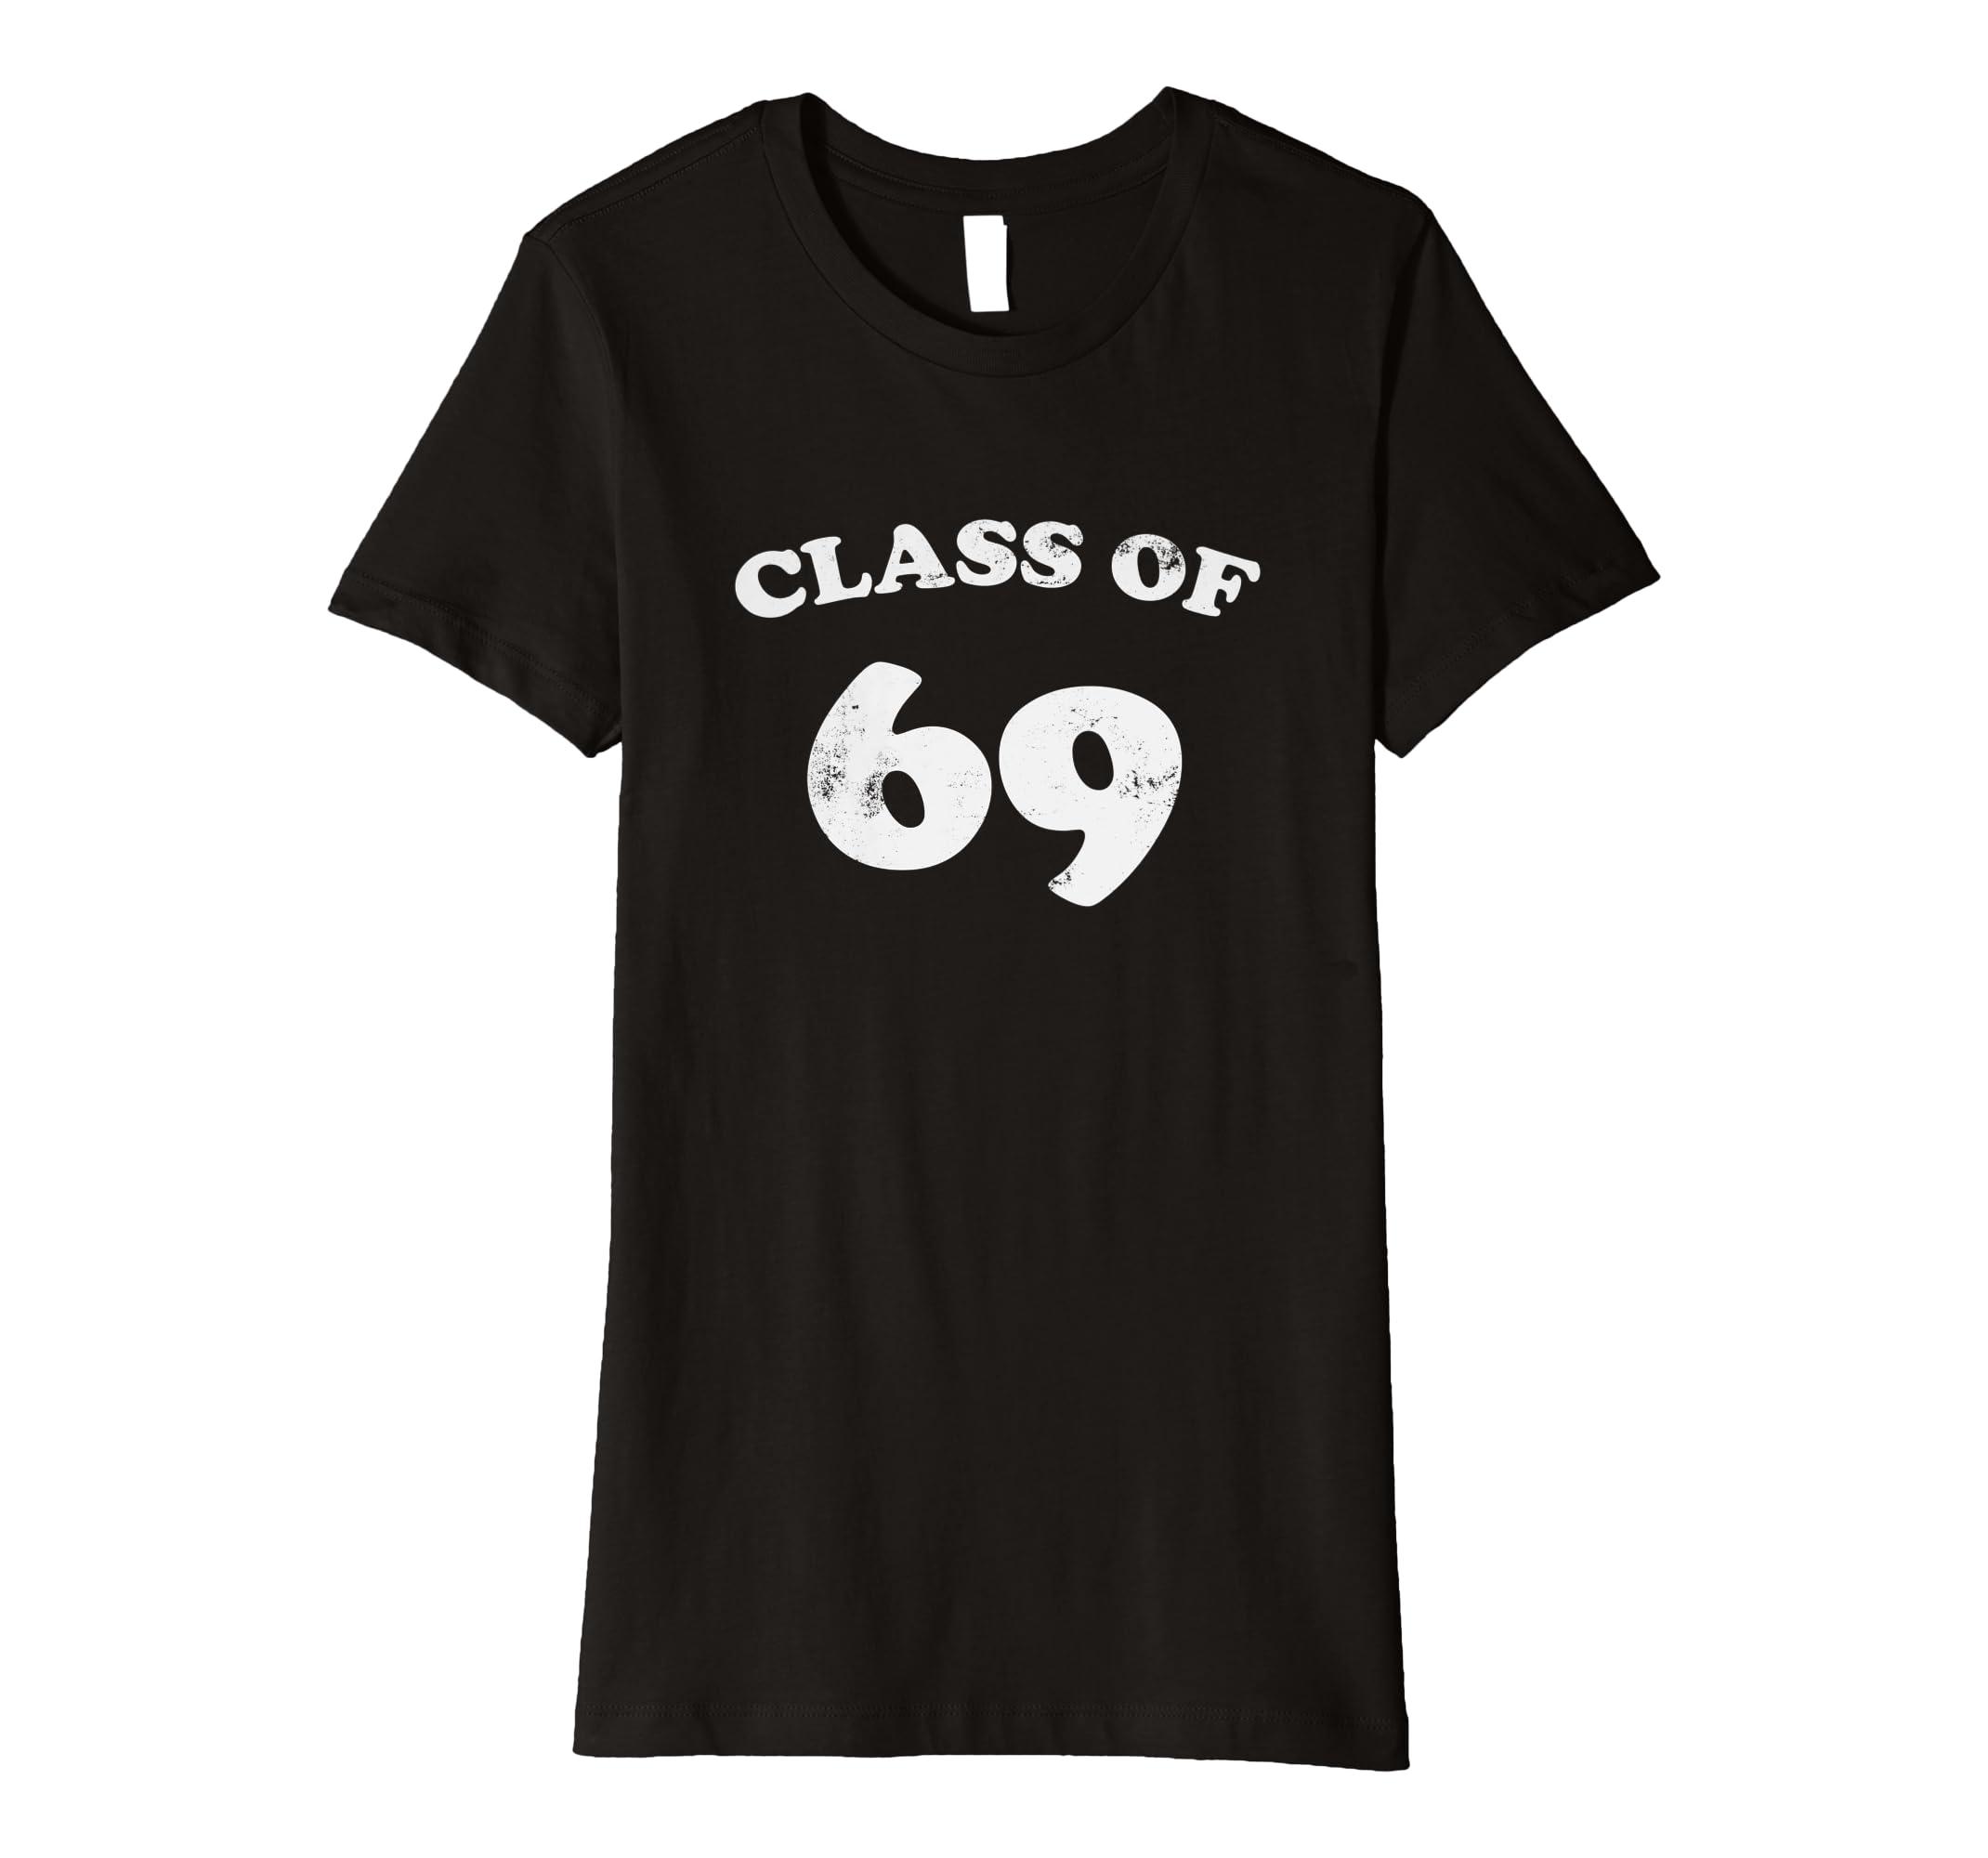 8f80bc3a98e6c Amazon.com: Class of 69 T-Shirt 1969 Class Reunion Shirt Vintage ...